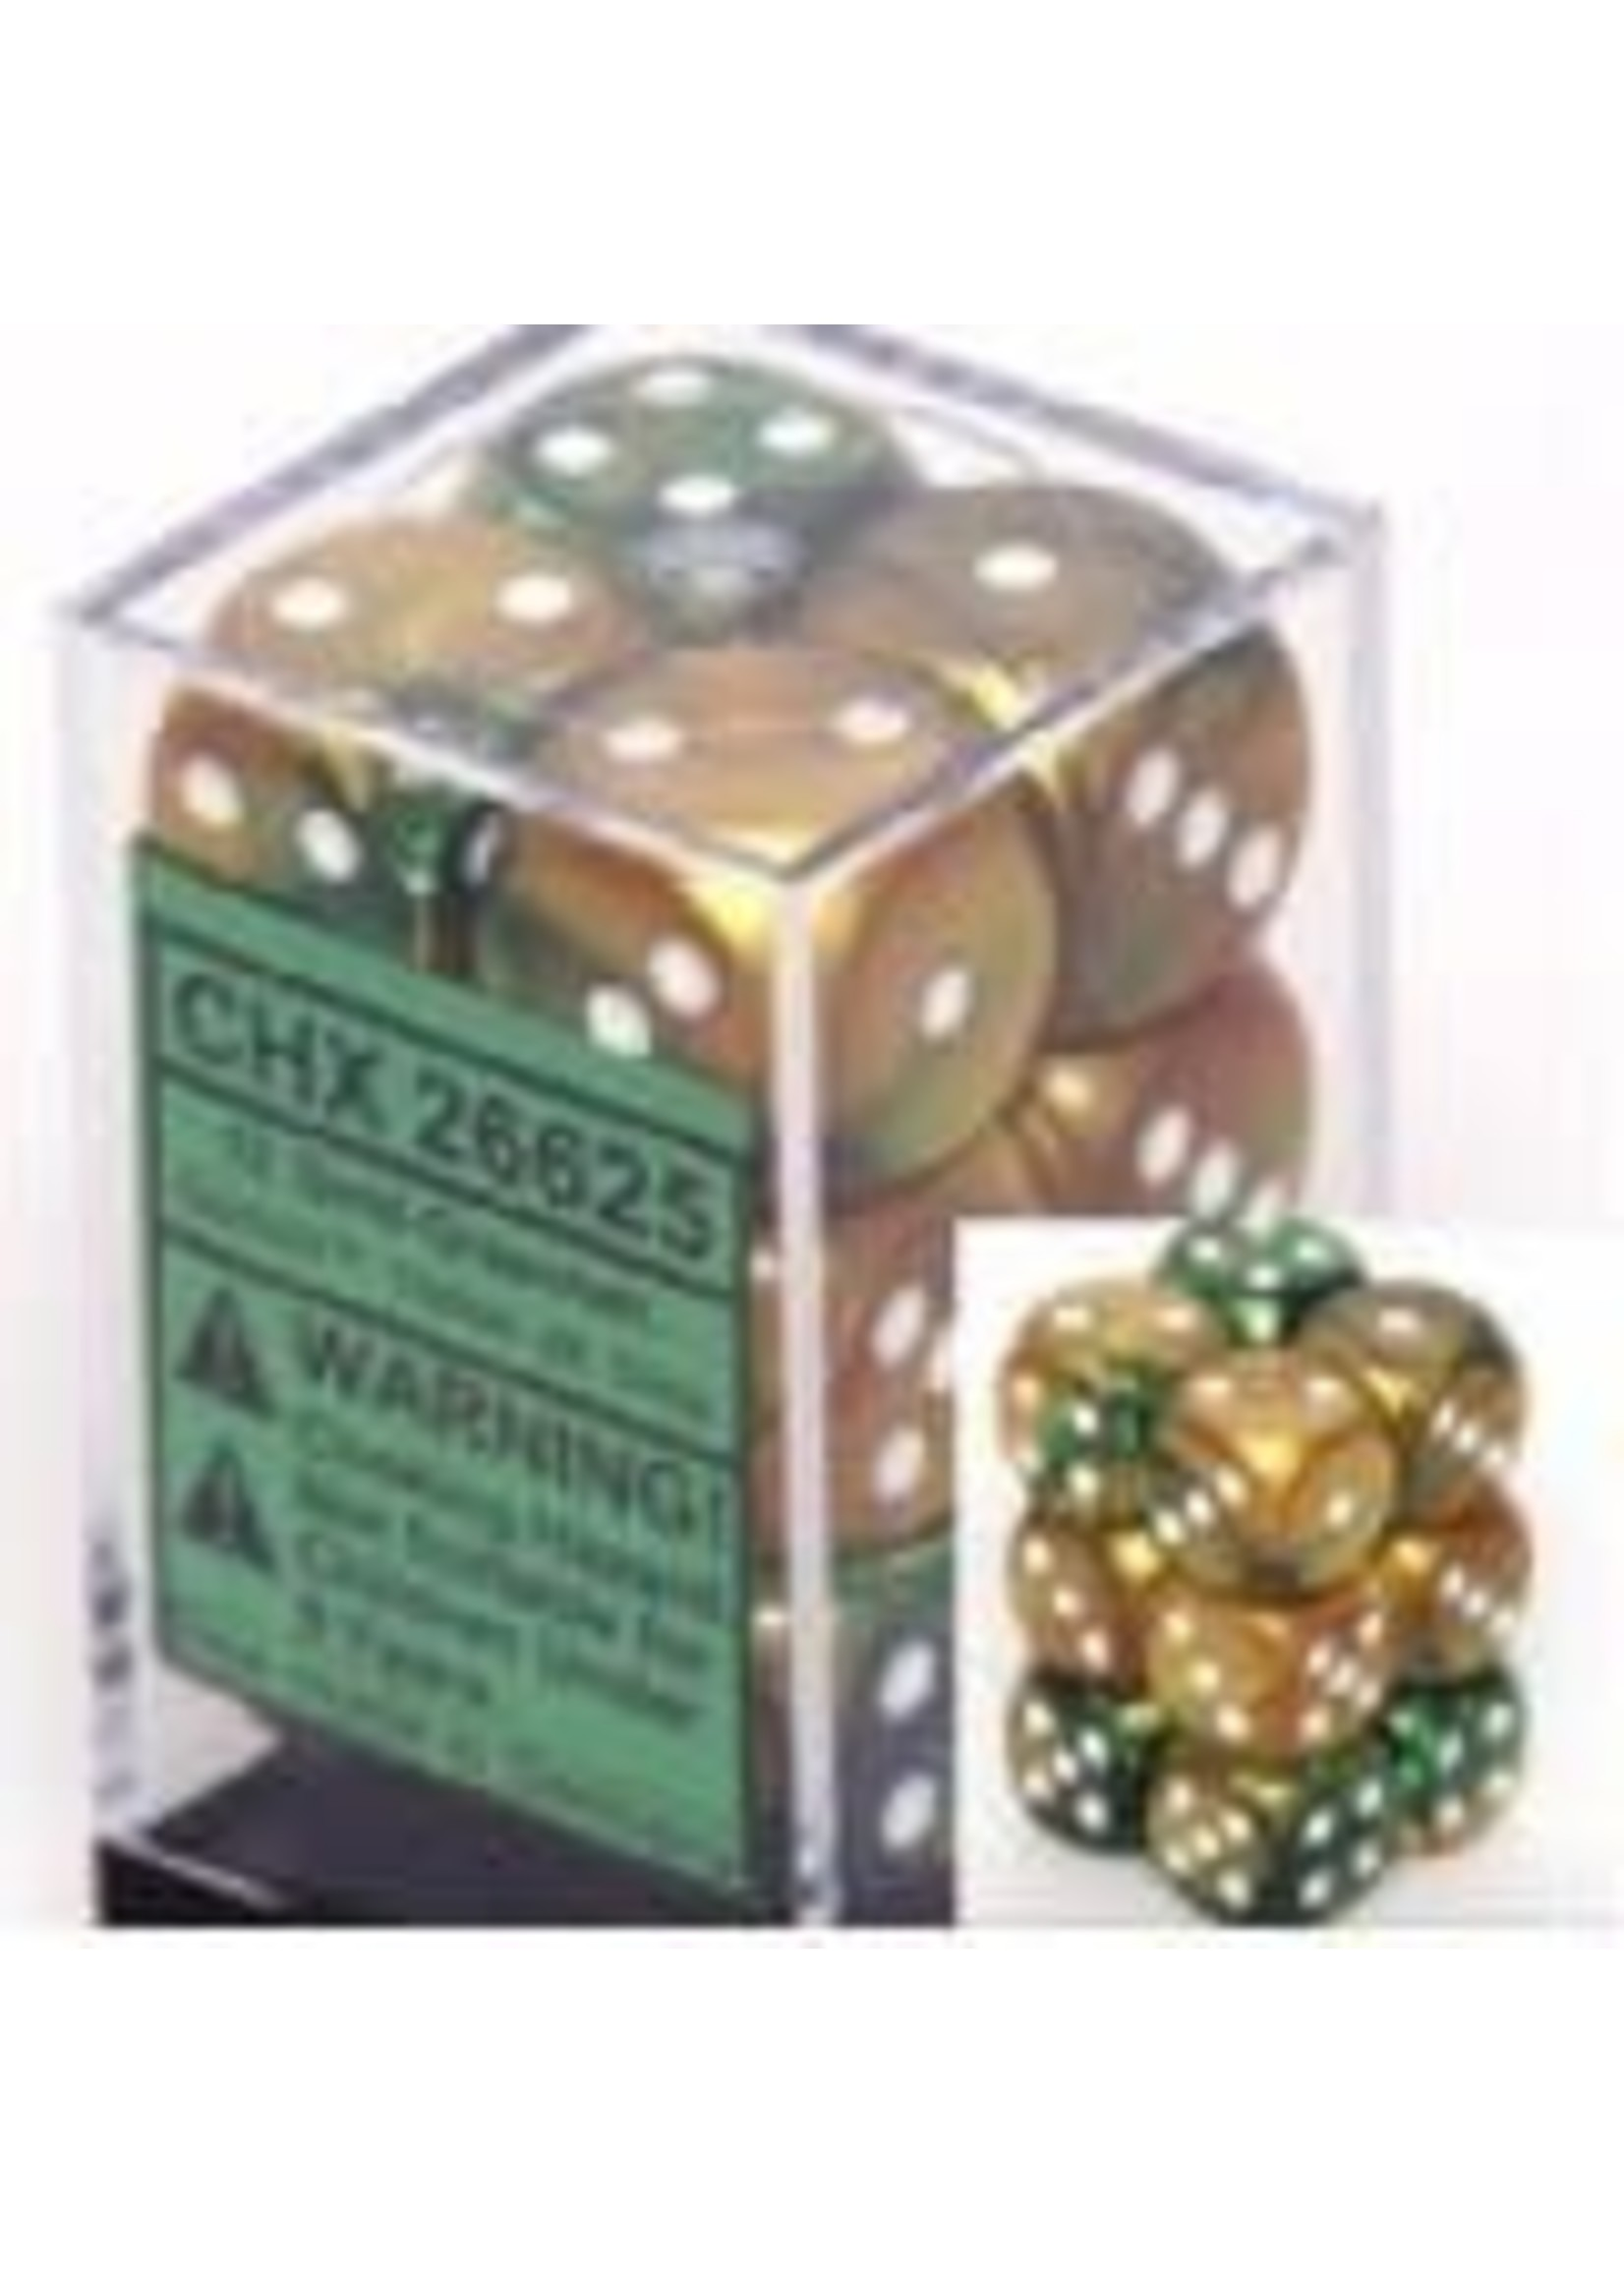 Chessex d6 Cube 16mm Gemini Gold & Green w/ White (12)